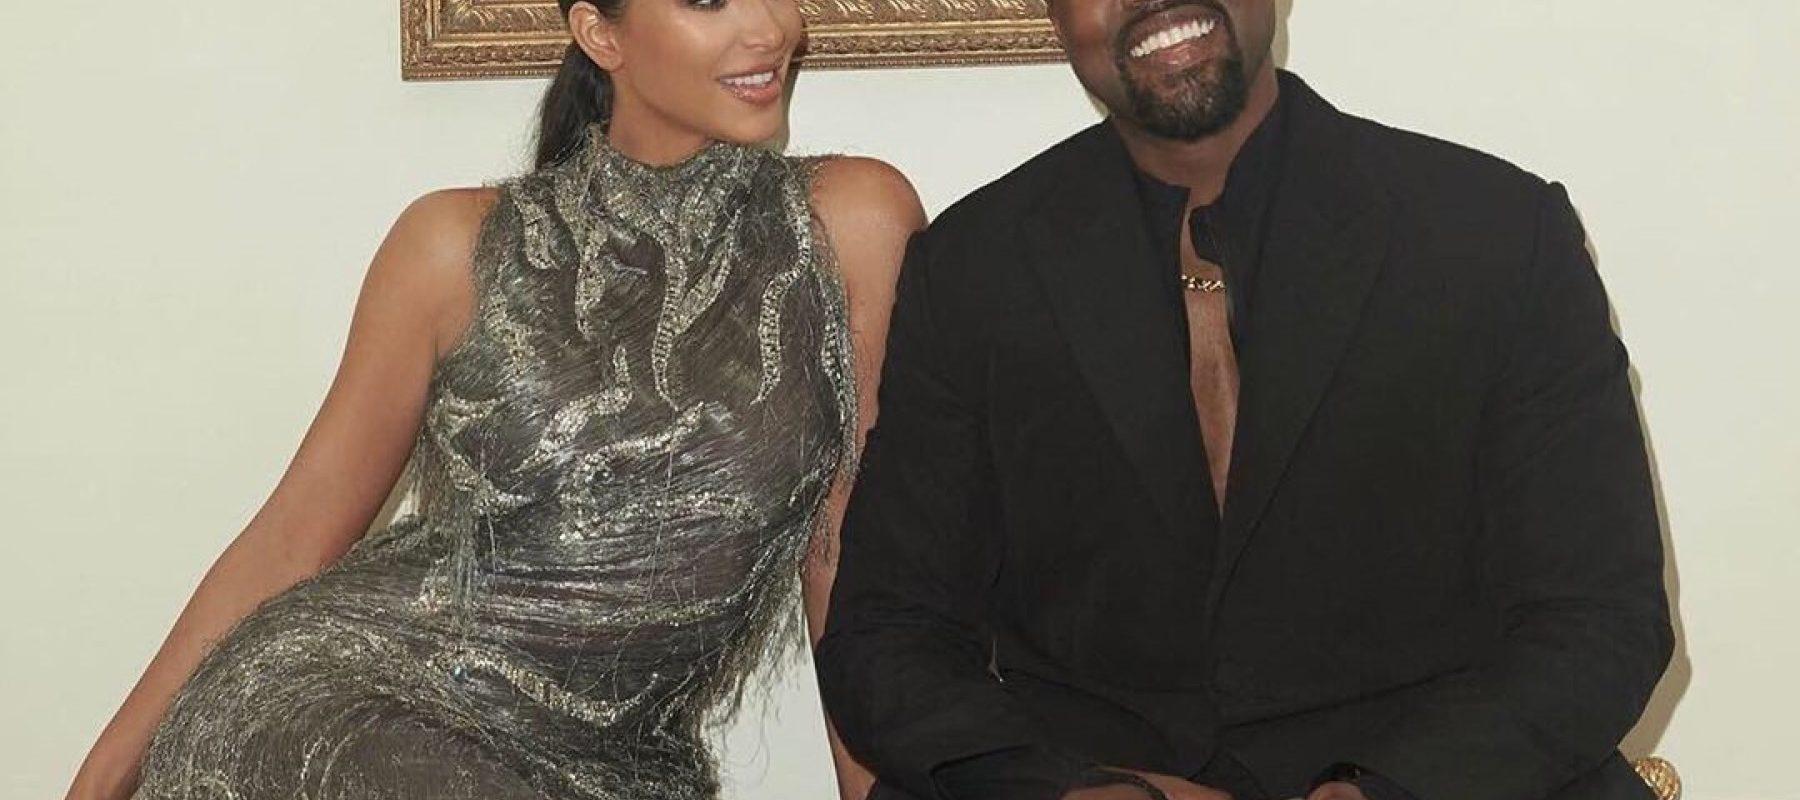 Kim Kardashian reacciona al nuevo romance de Kanye West con Irina Shayk